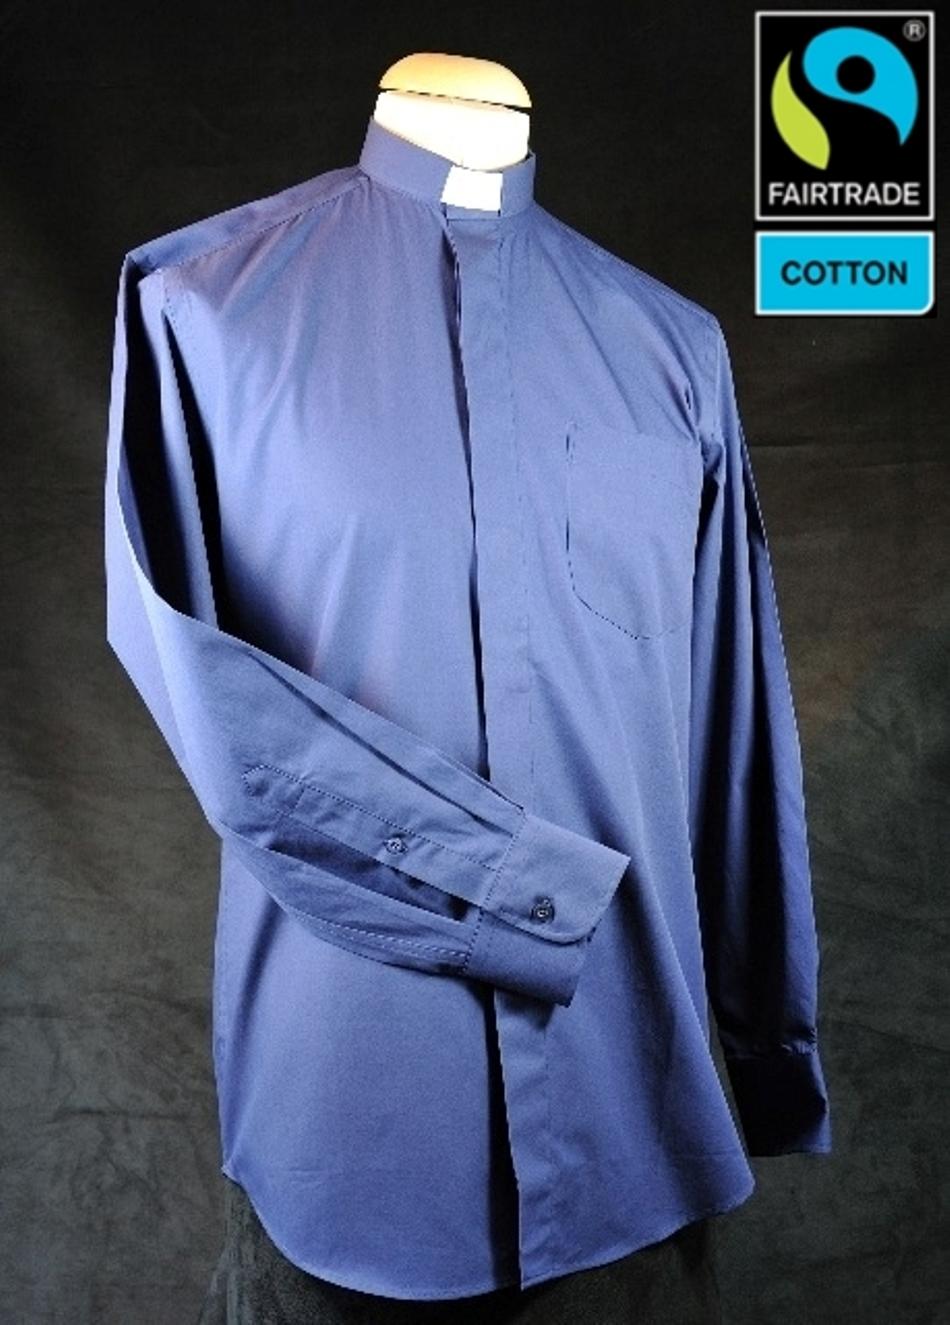 Collarhemd, dunkelblau, Fairtrad Baumwolle